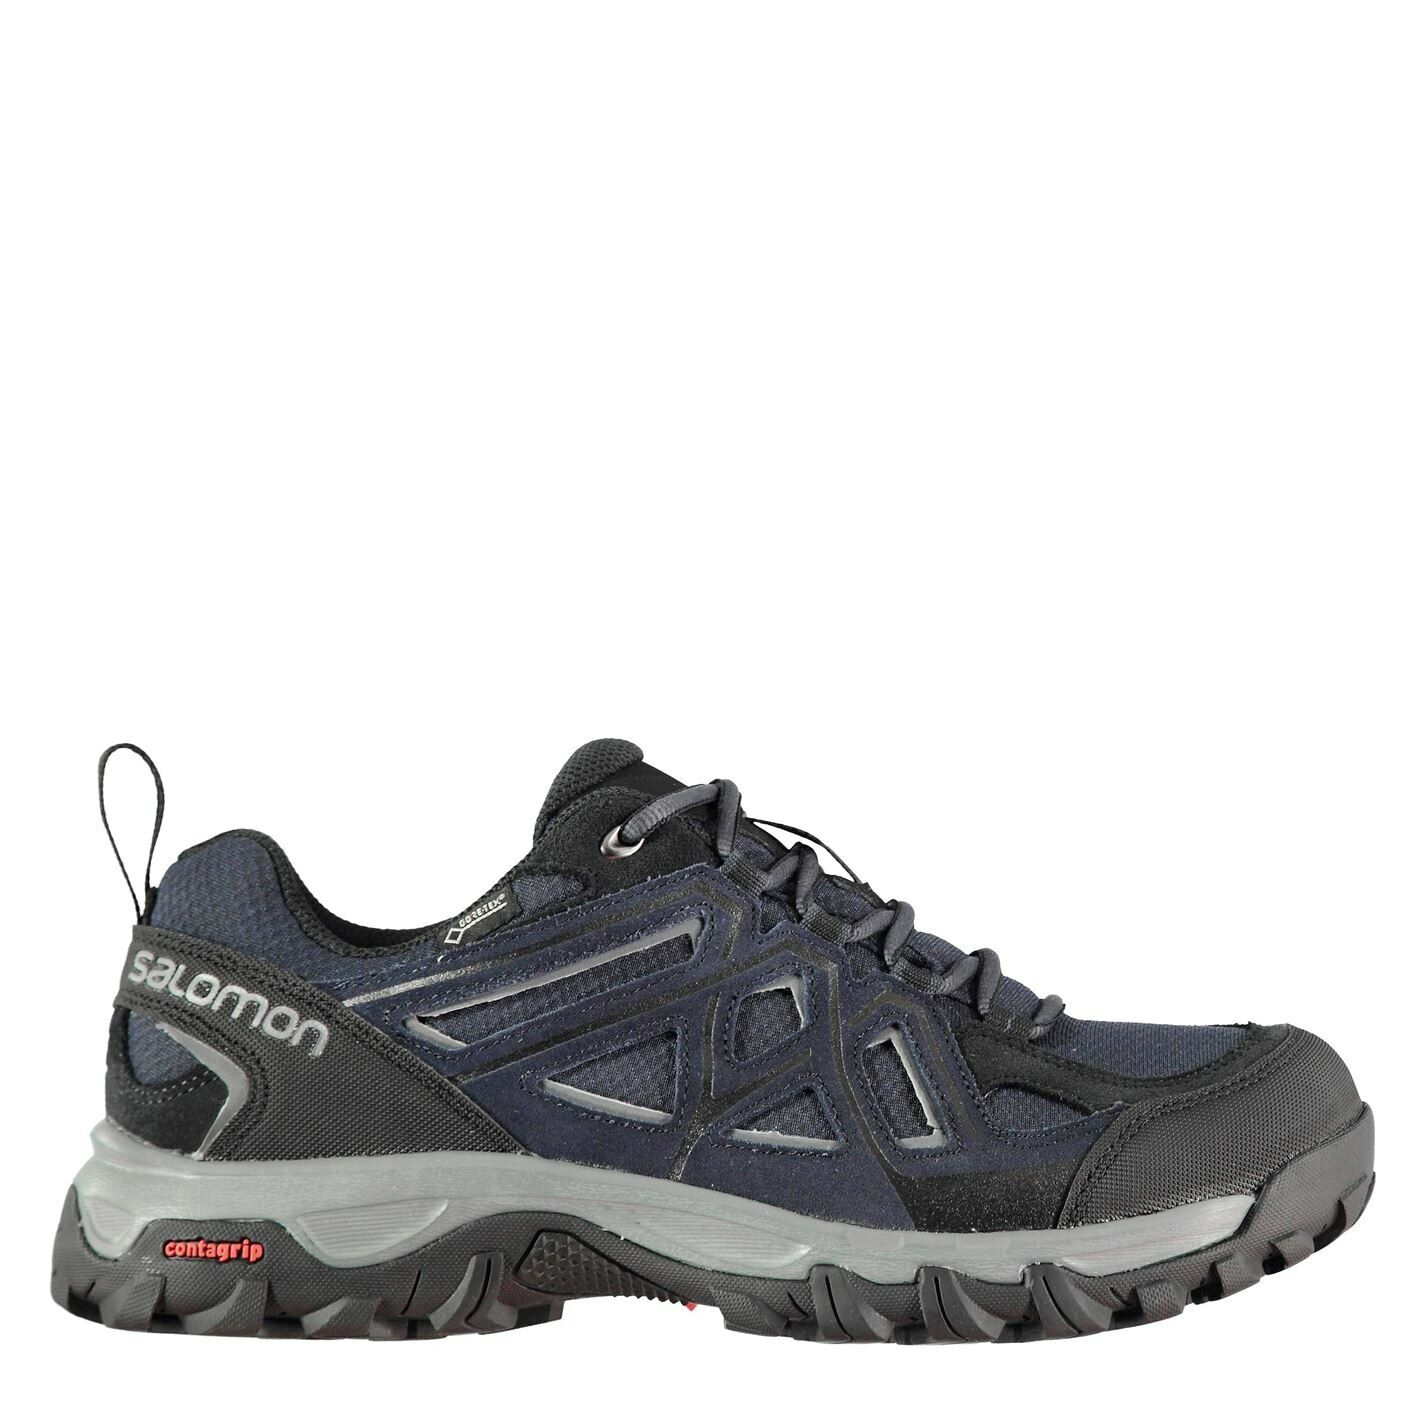 Salomon Evasion 2 GTX Mens Walking Shoes (183054-18305492) - Woomie.gr 17858e9f076